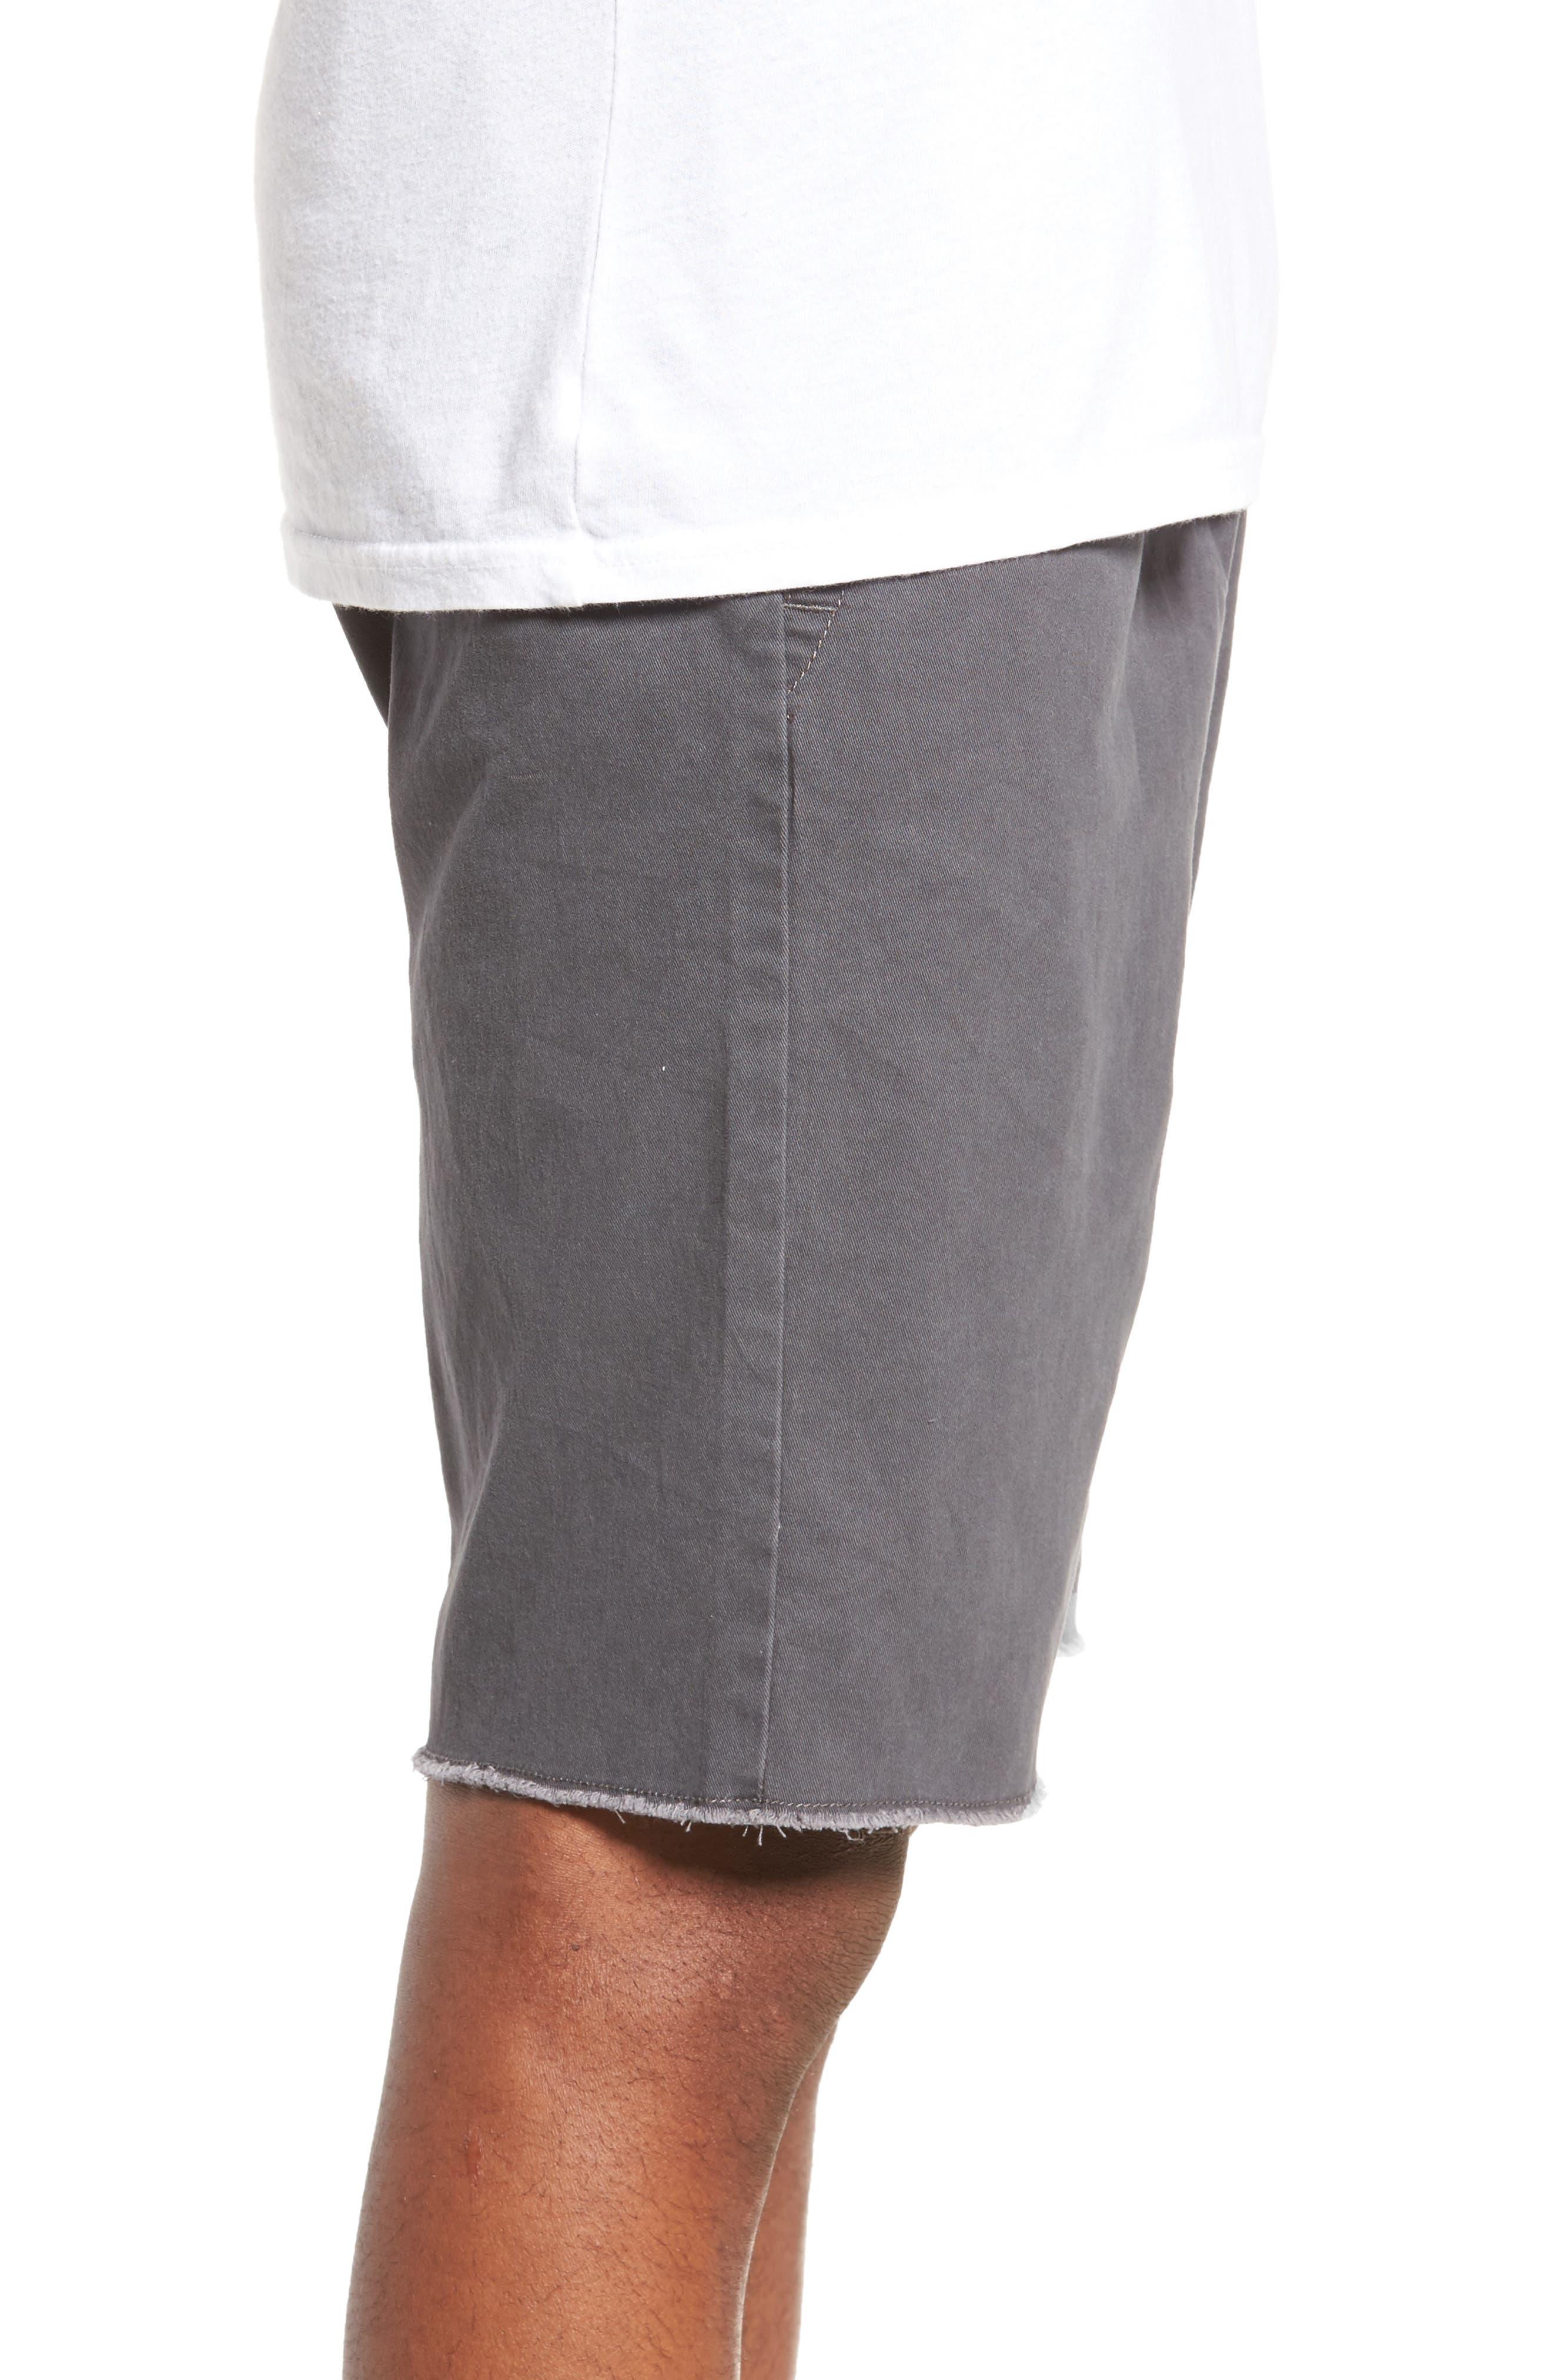 Jogger Shorts,                             Alternate thumbnail 3, color,                             GREY ONYX